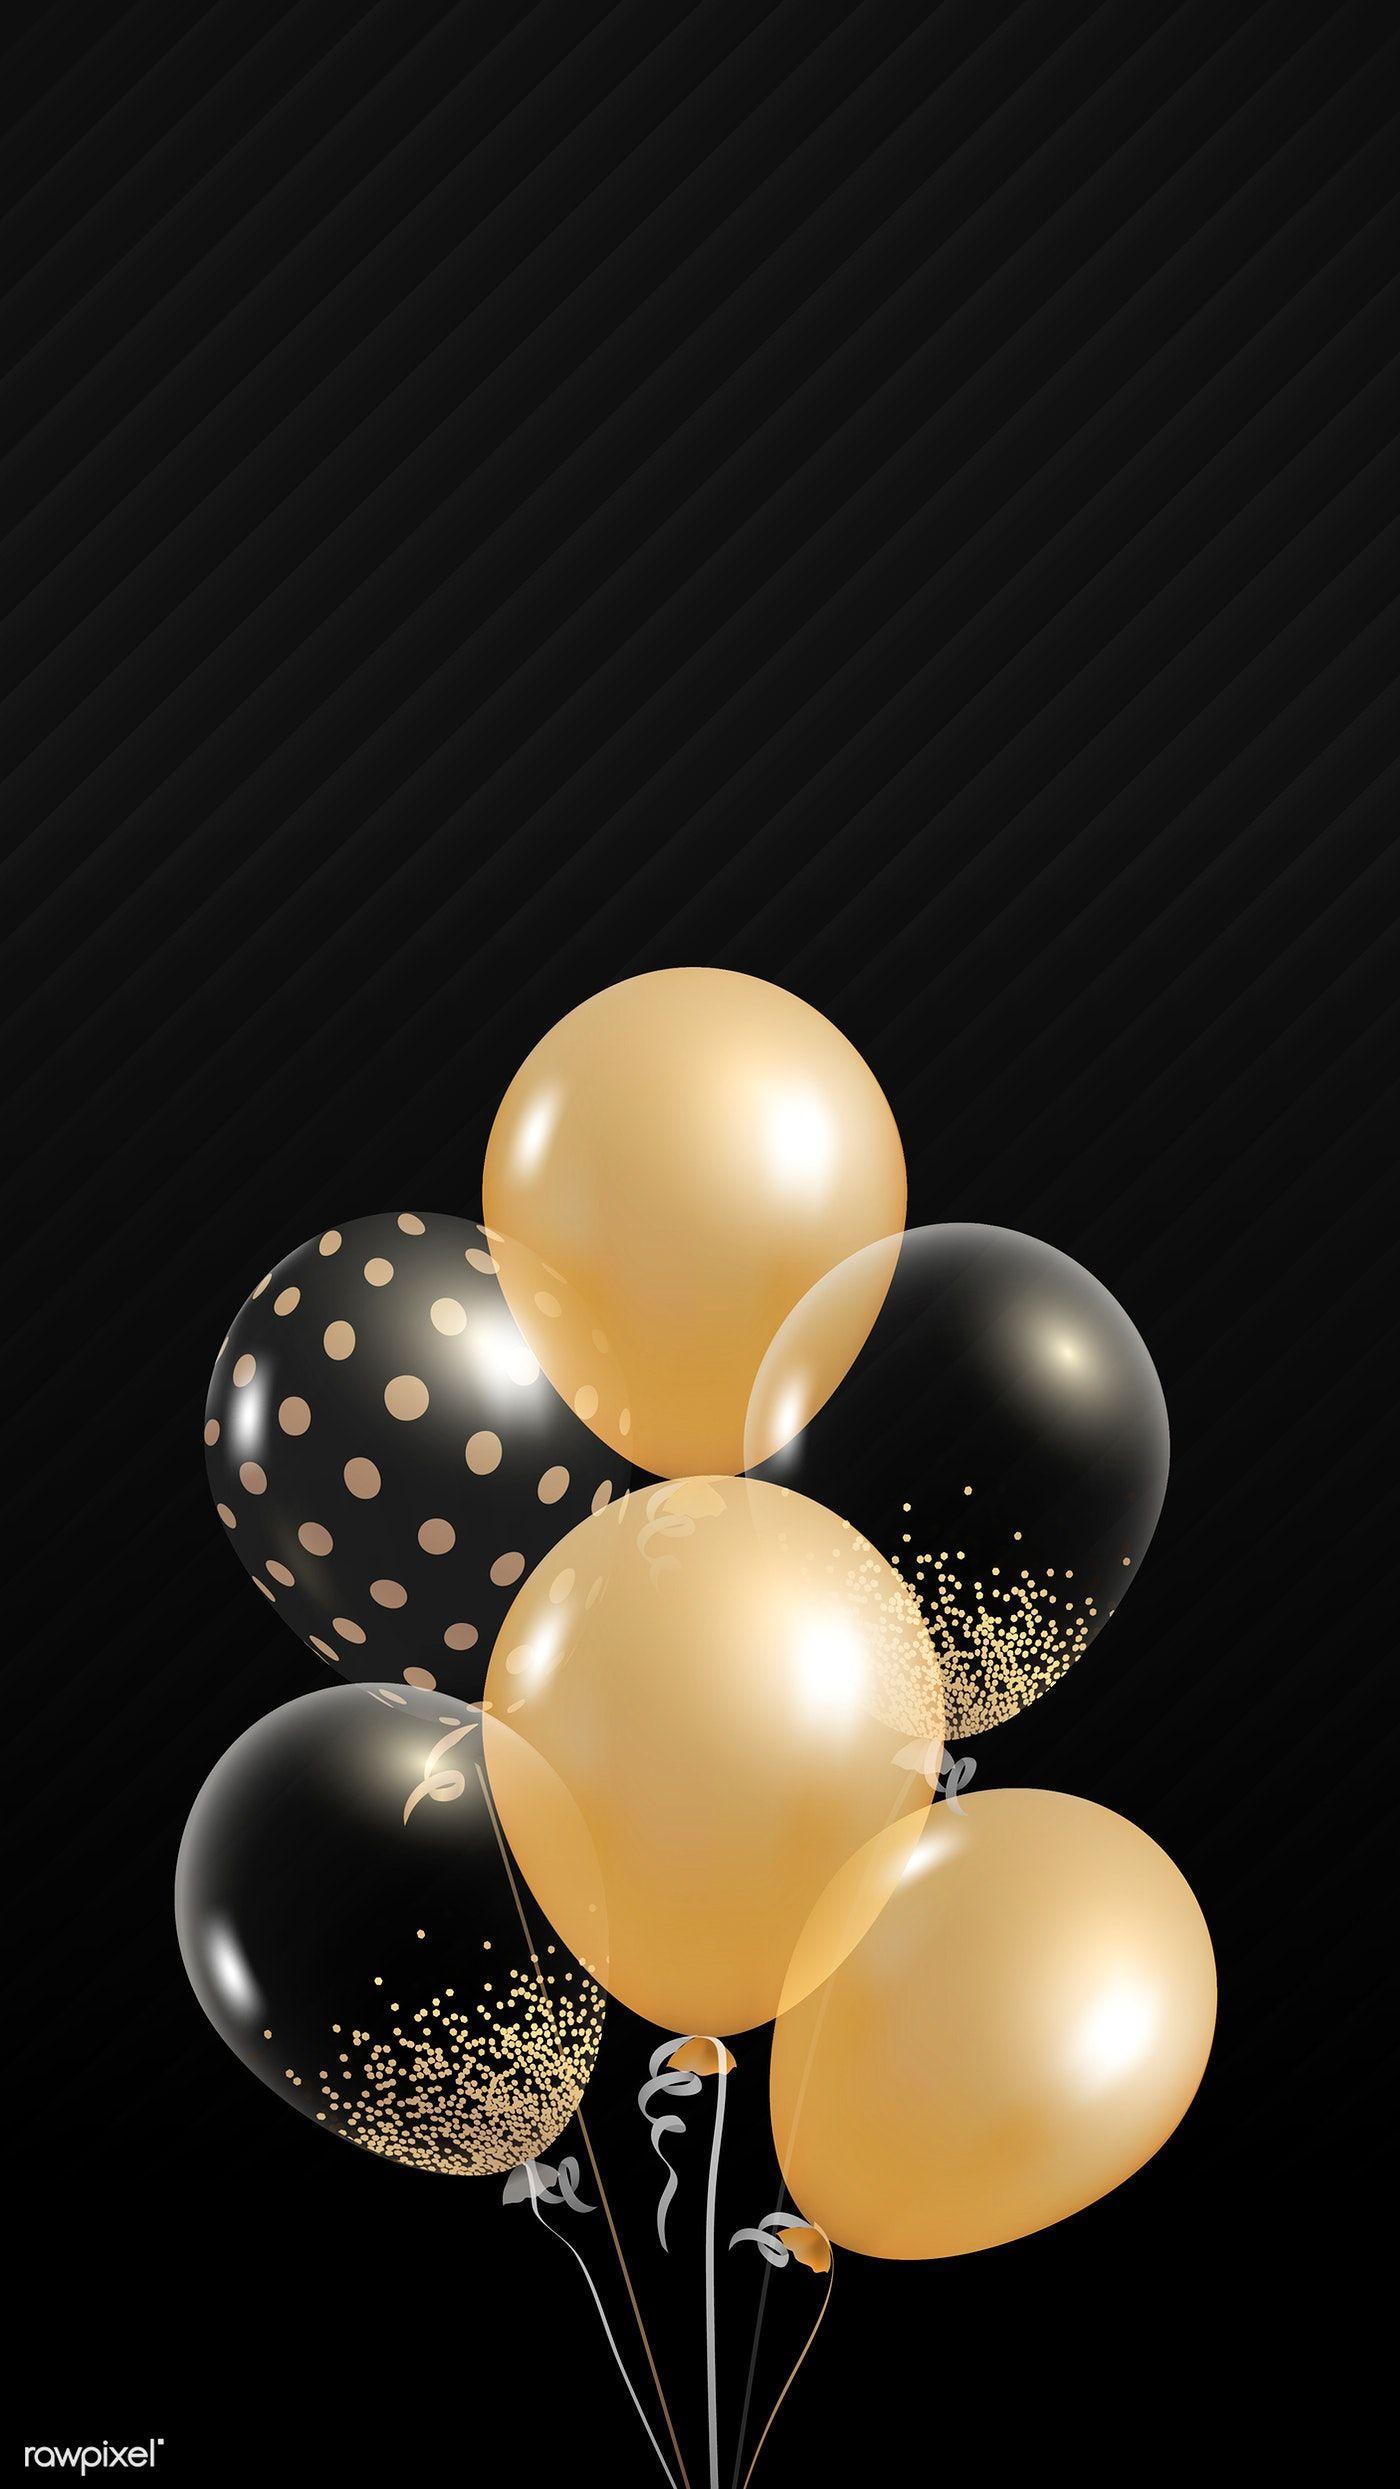 Elegant Balloons Design Vector On Black Background Free Image By